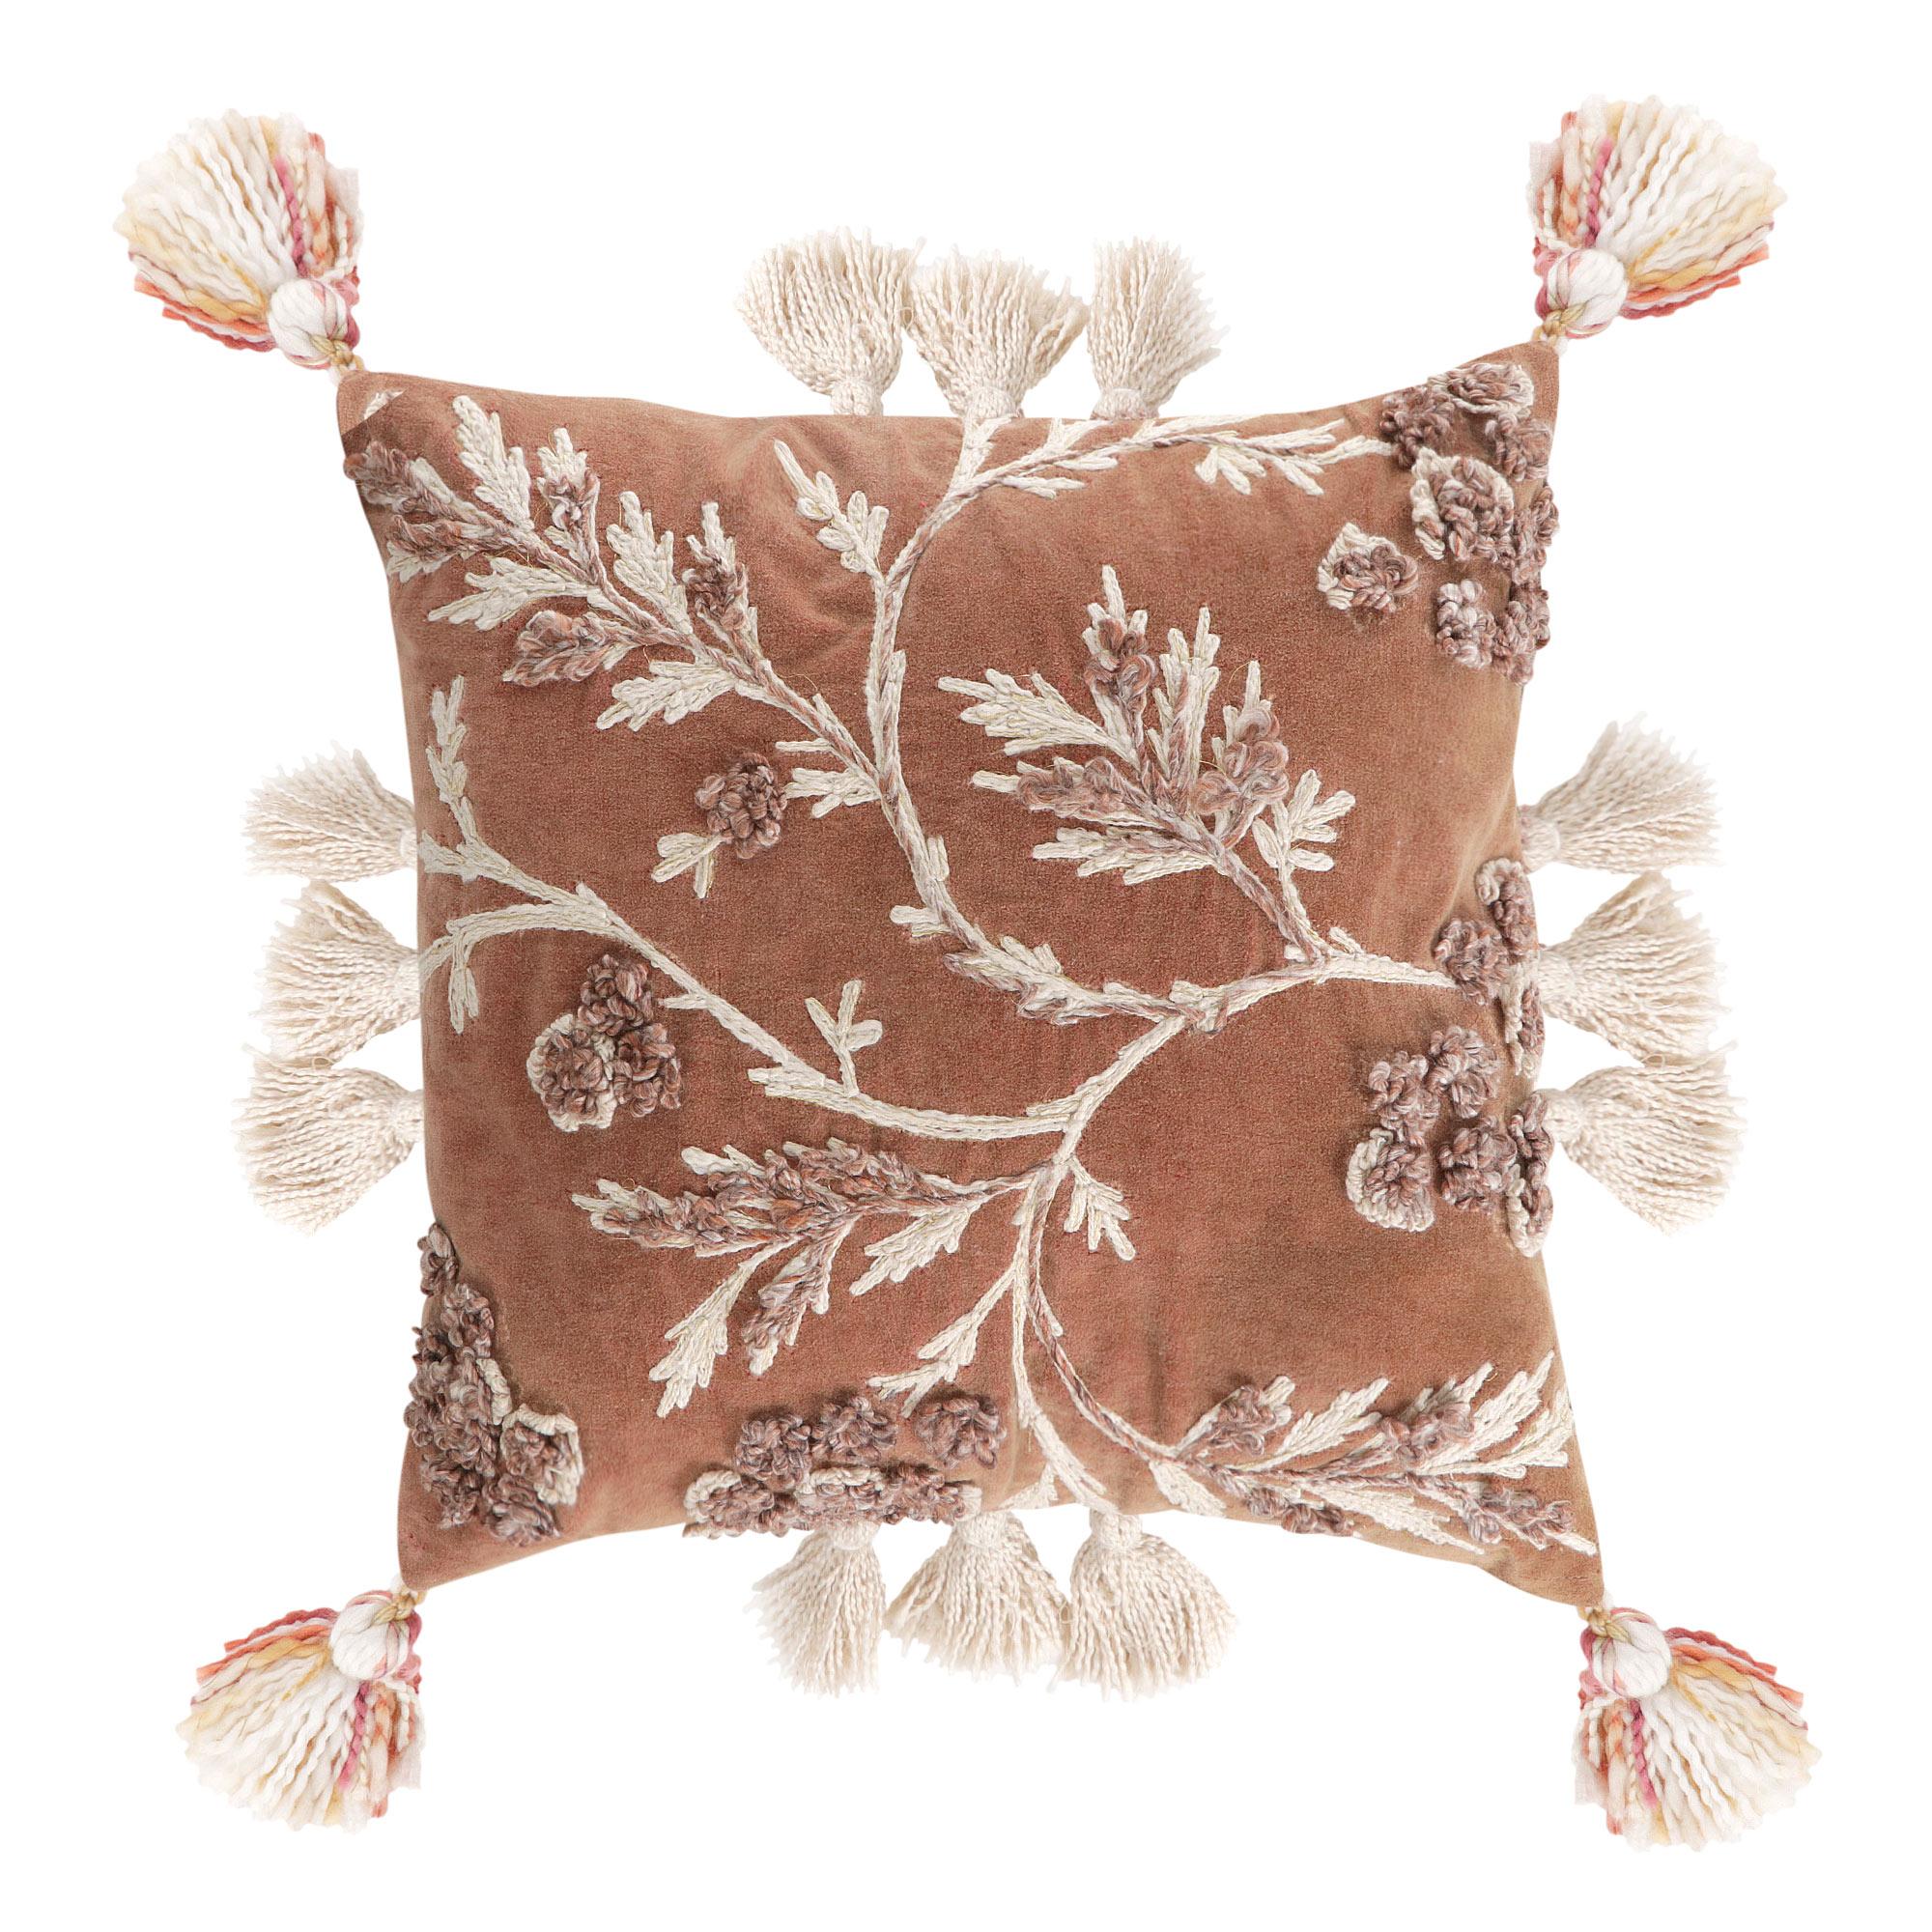 Подушка декоративная Laroche 50х50 подушка декоративная laroche 50 х 50 см